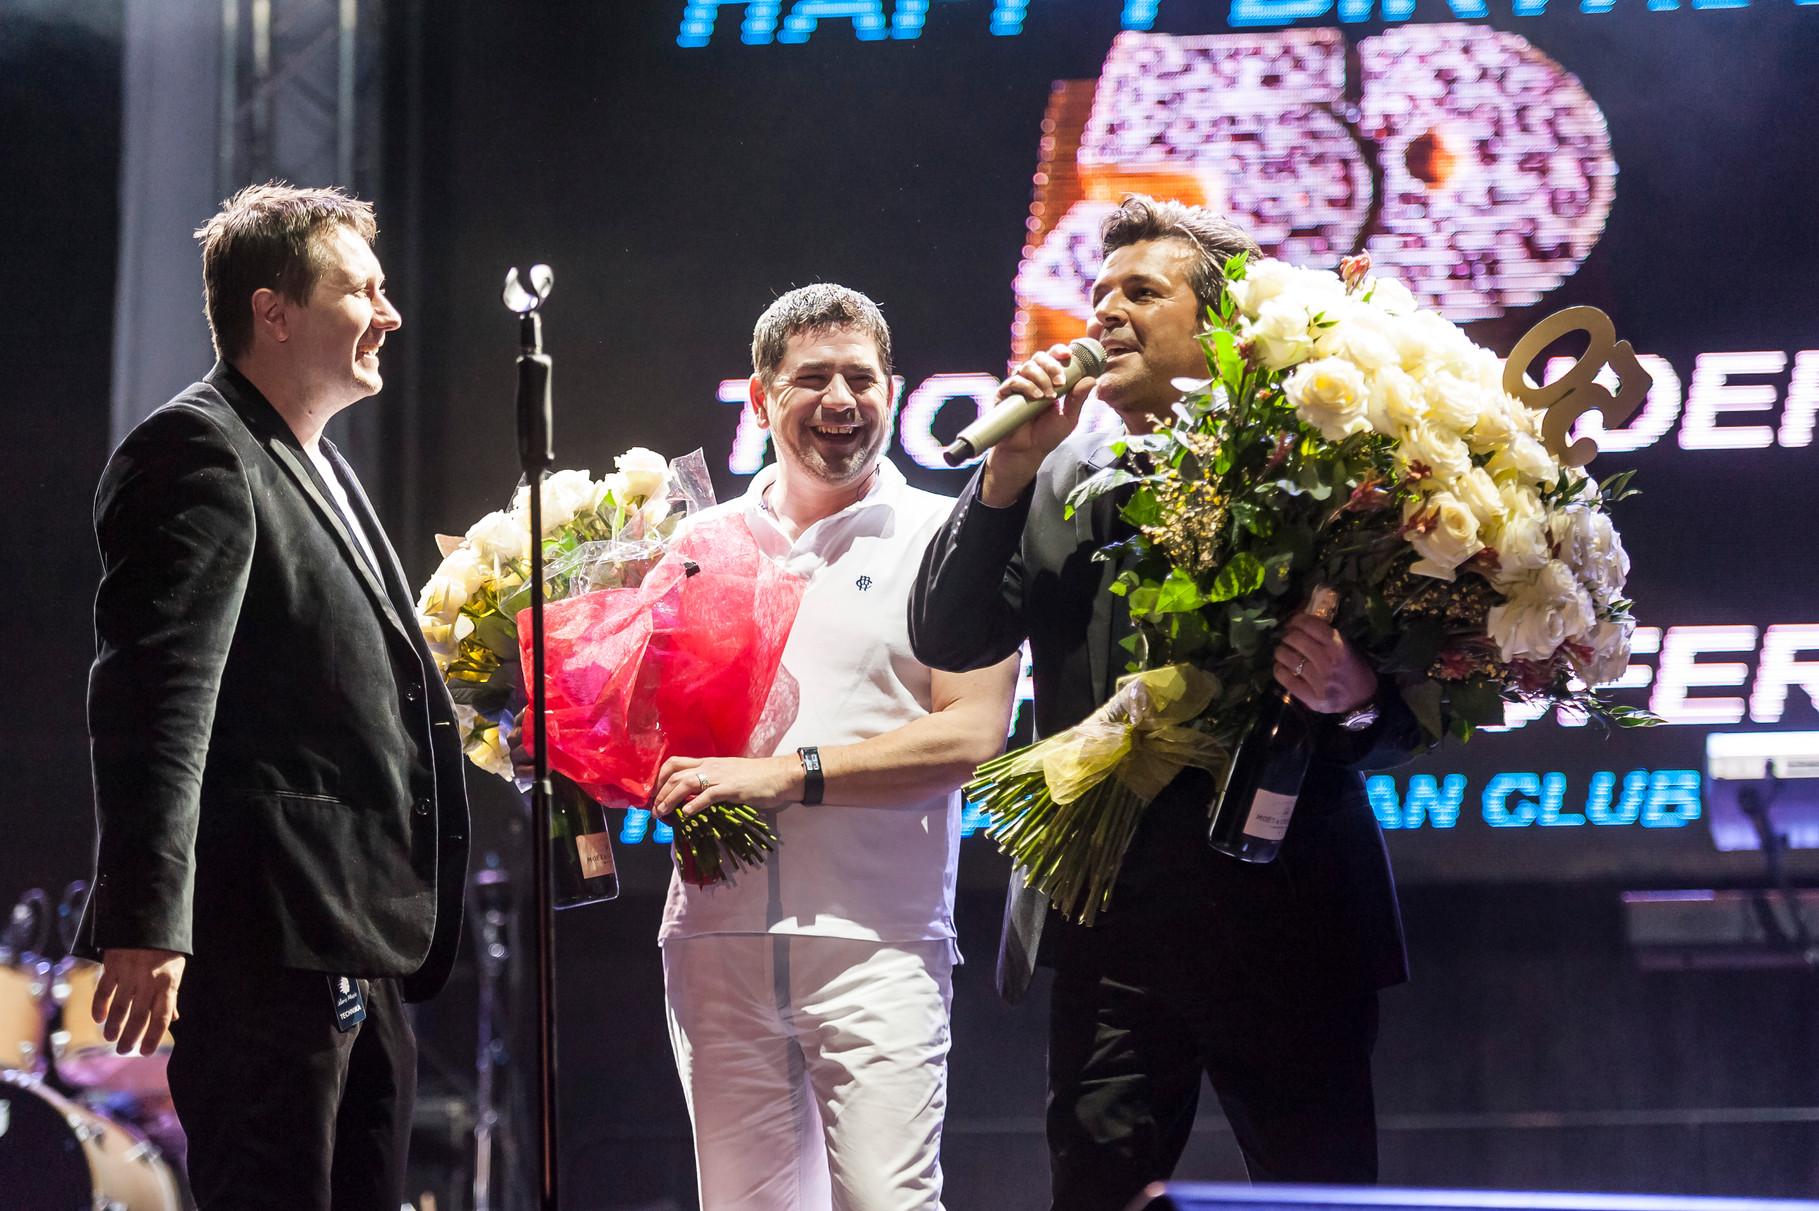 50th birthday of Thomas and Bernd - congratulations of the TA-FC Poland